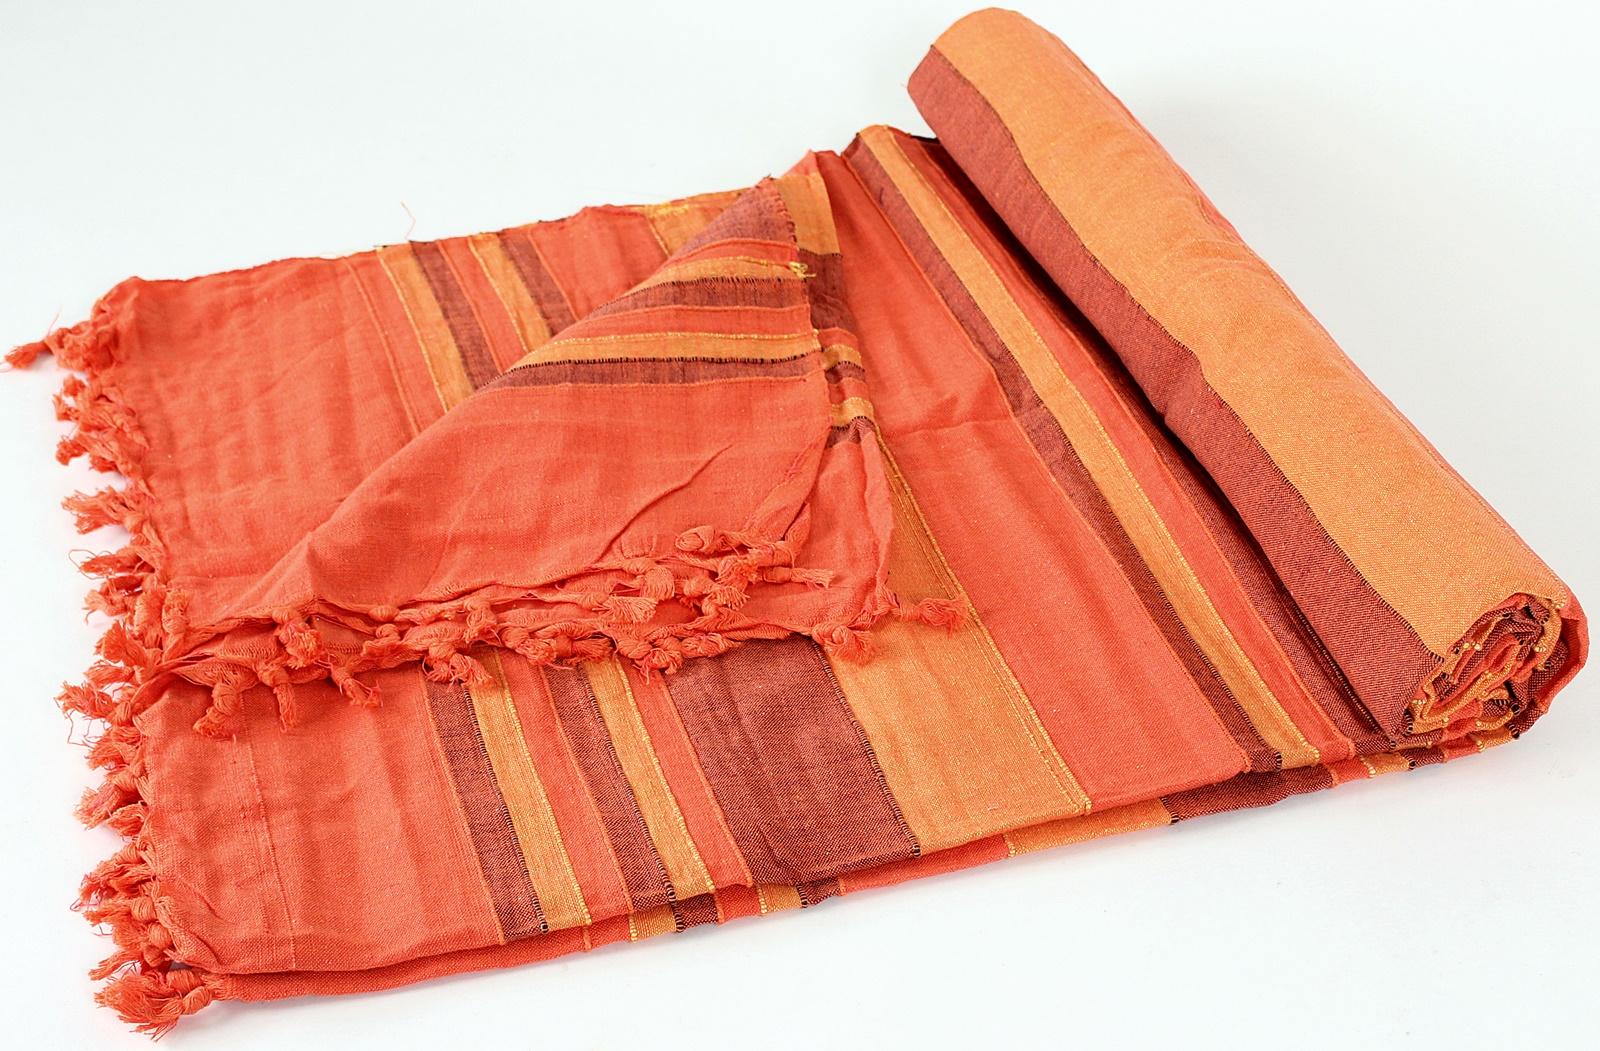 buddha arts more orange gestreifte gewebte tagesdecke. Black Bedroom Furniture Sets. Home Design Ideas